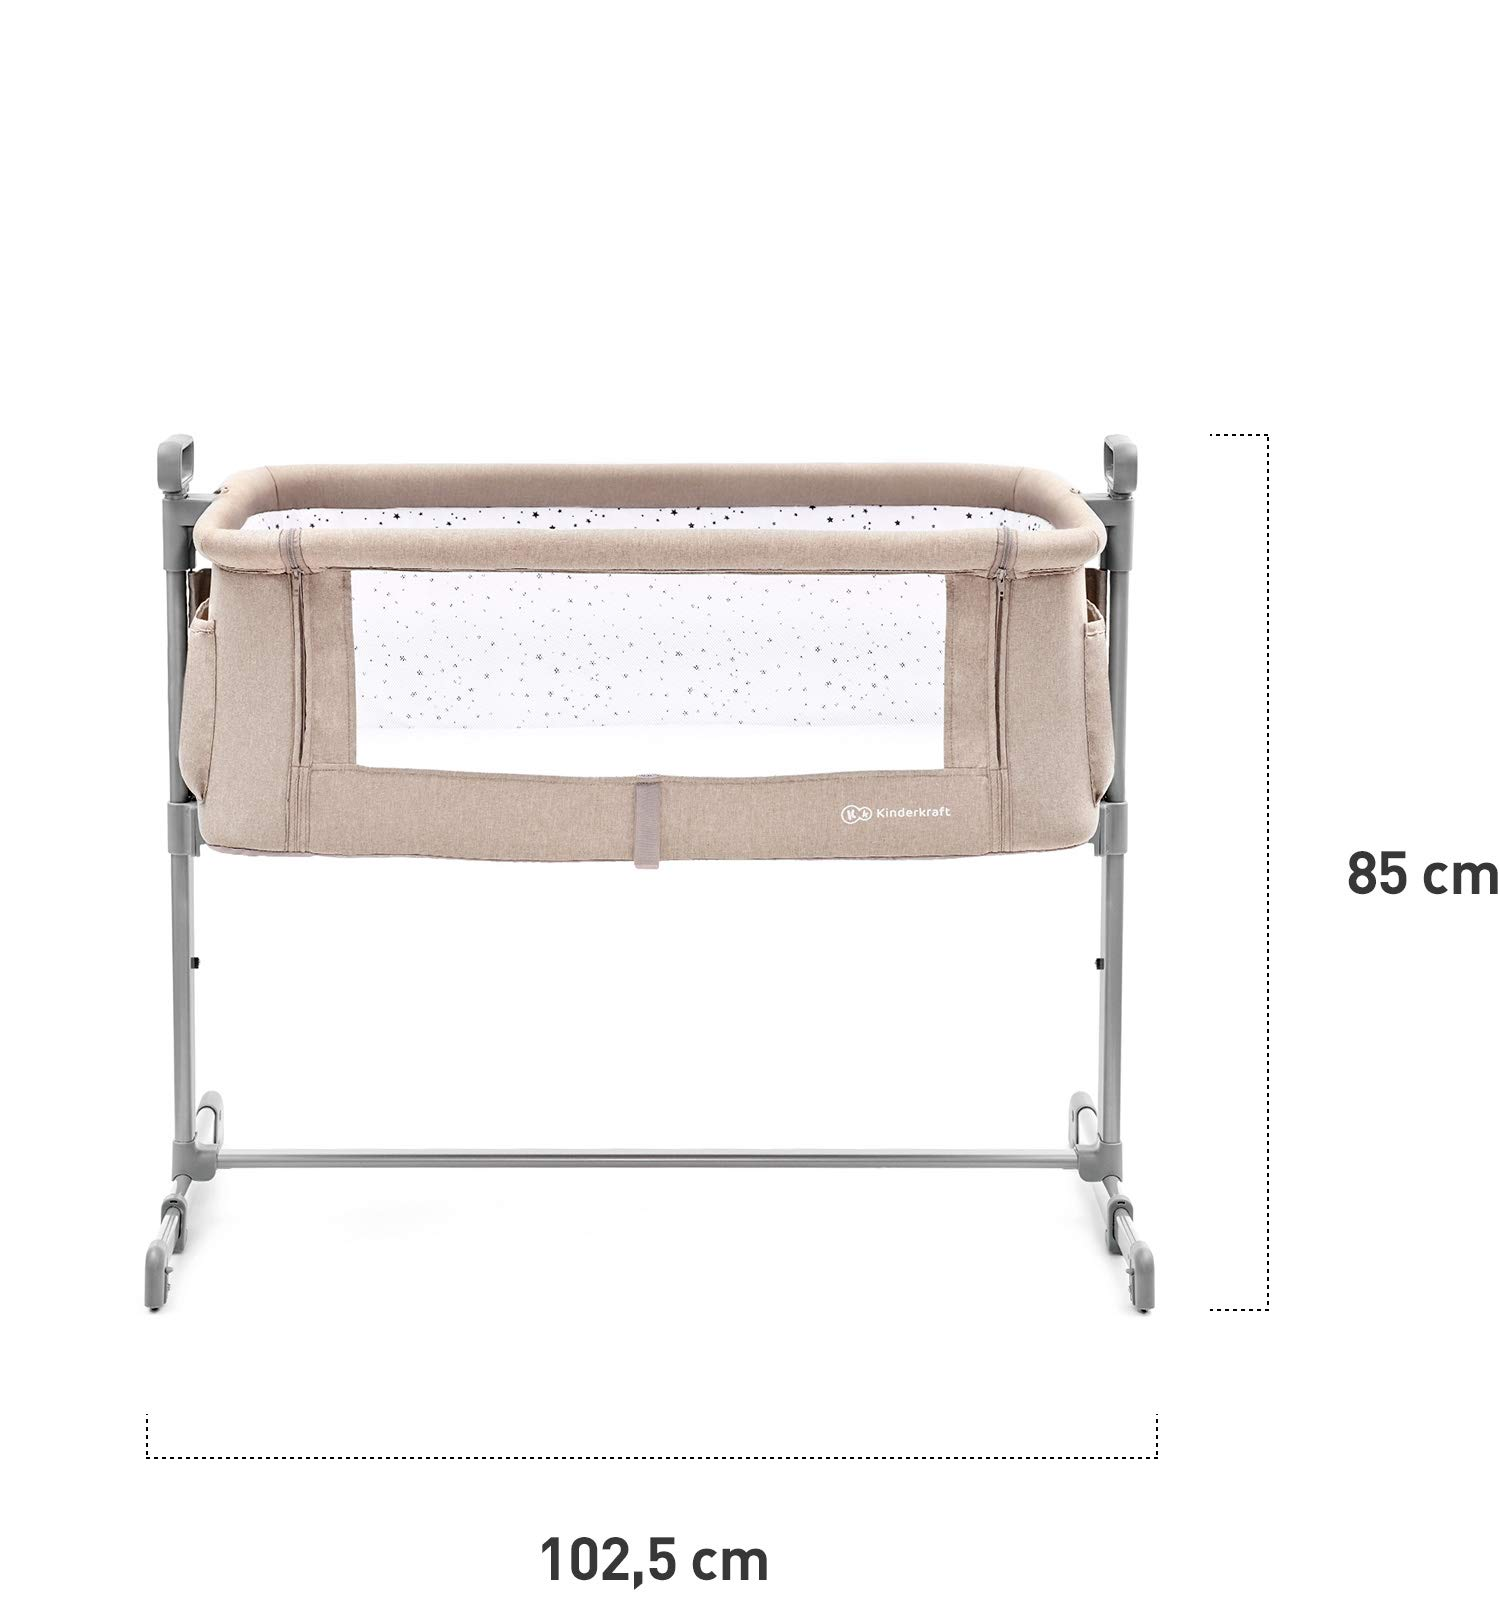 Kinderkraft Neste 2in1 Cot with Mattress Baby Bed Children Baby Travel Cot kk KinderKraft  6